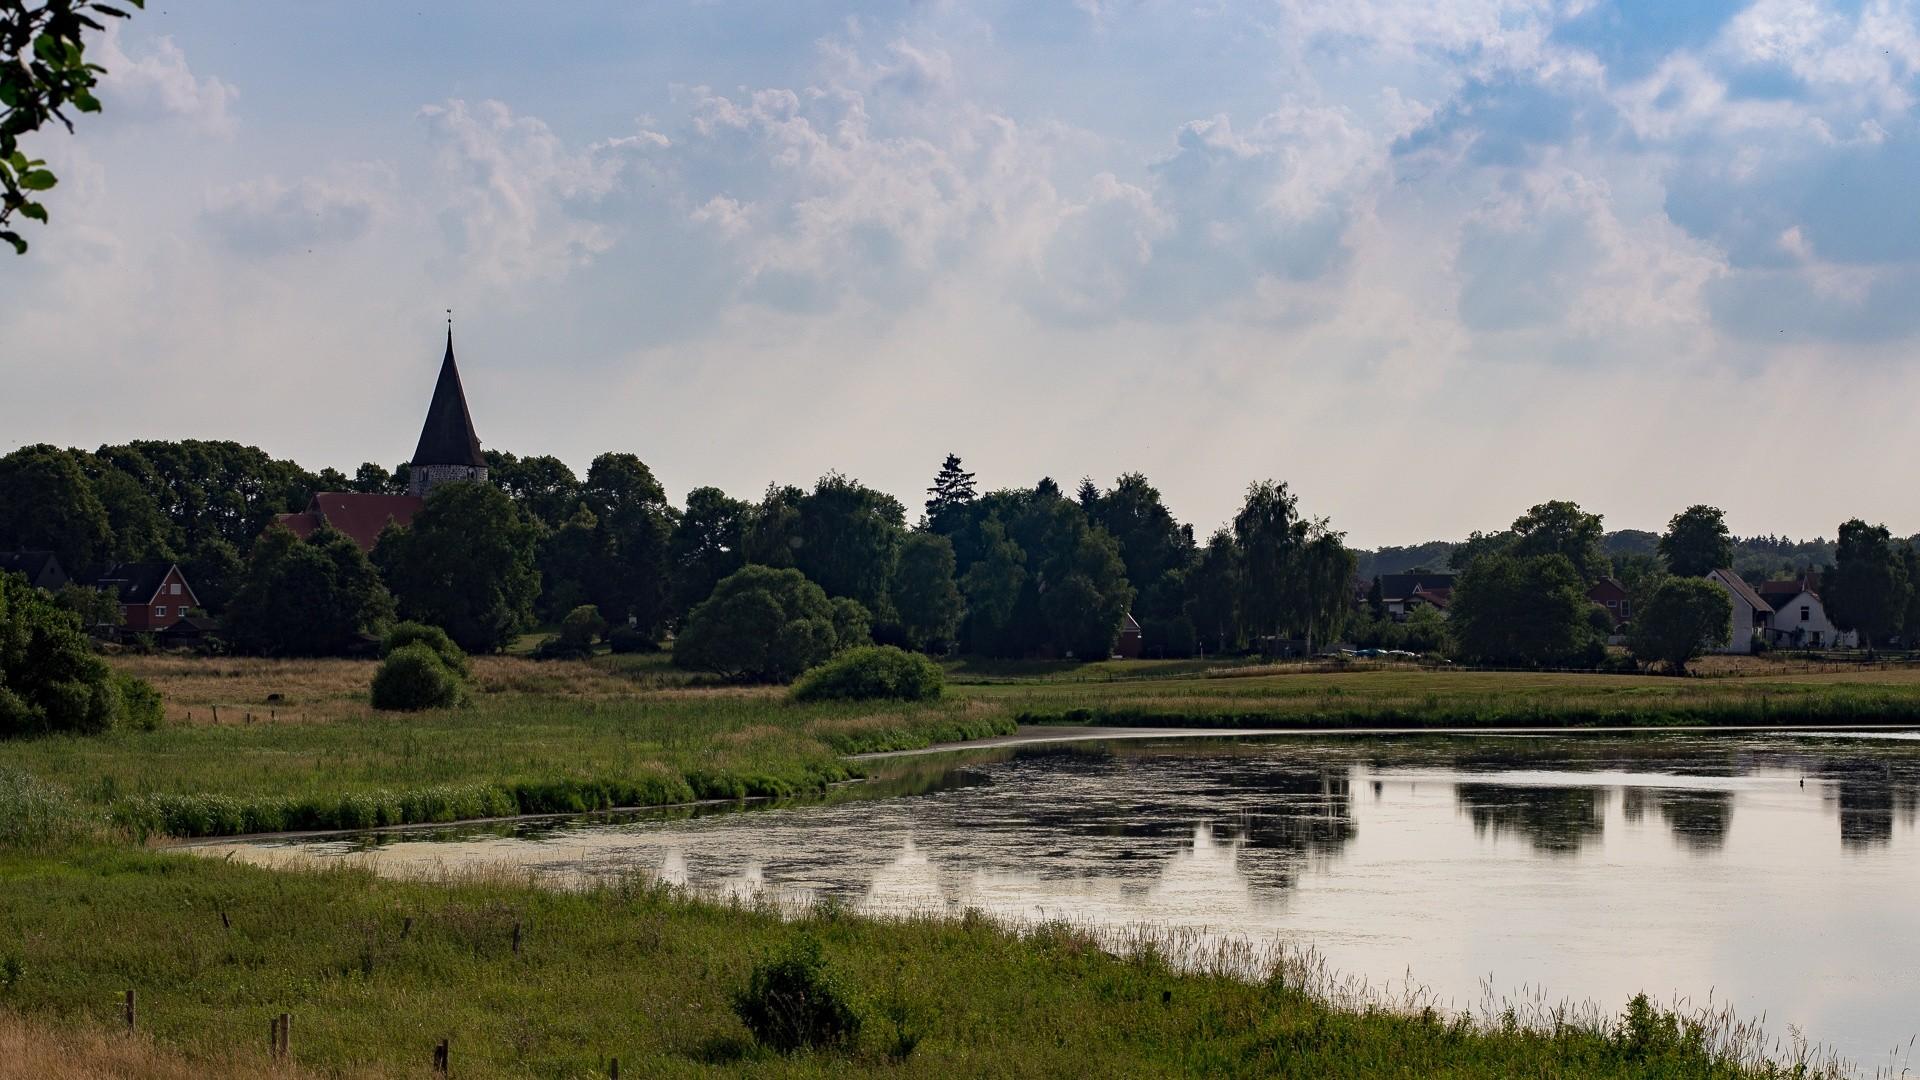 Ruppersdorfer See